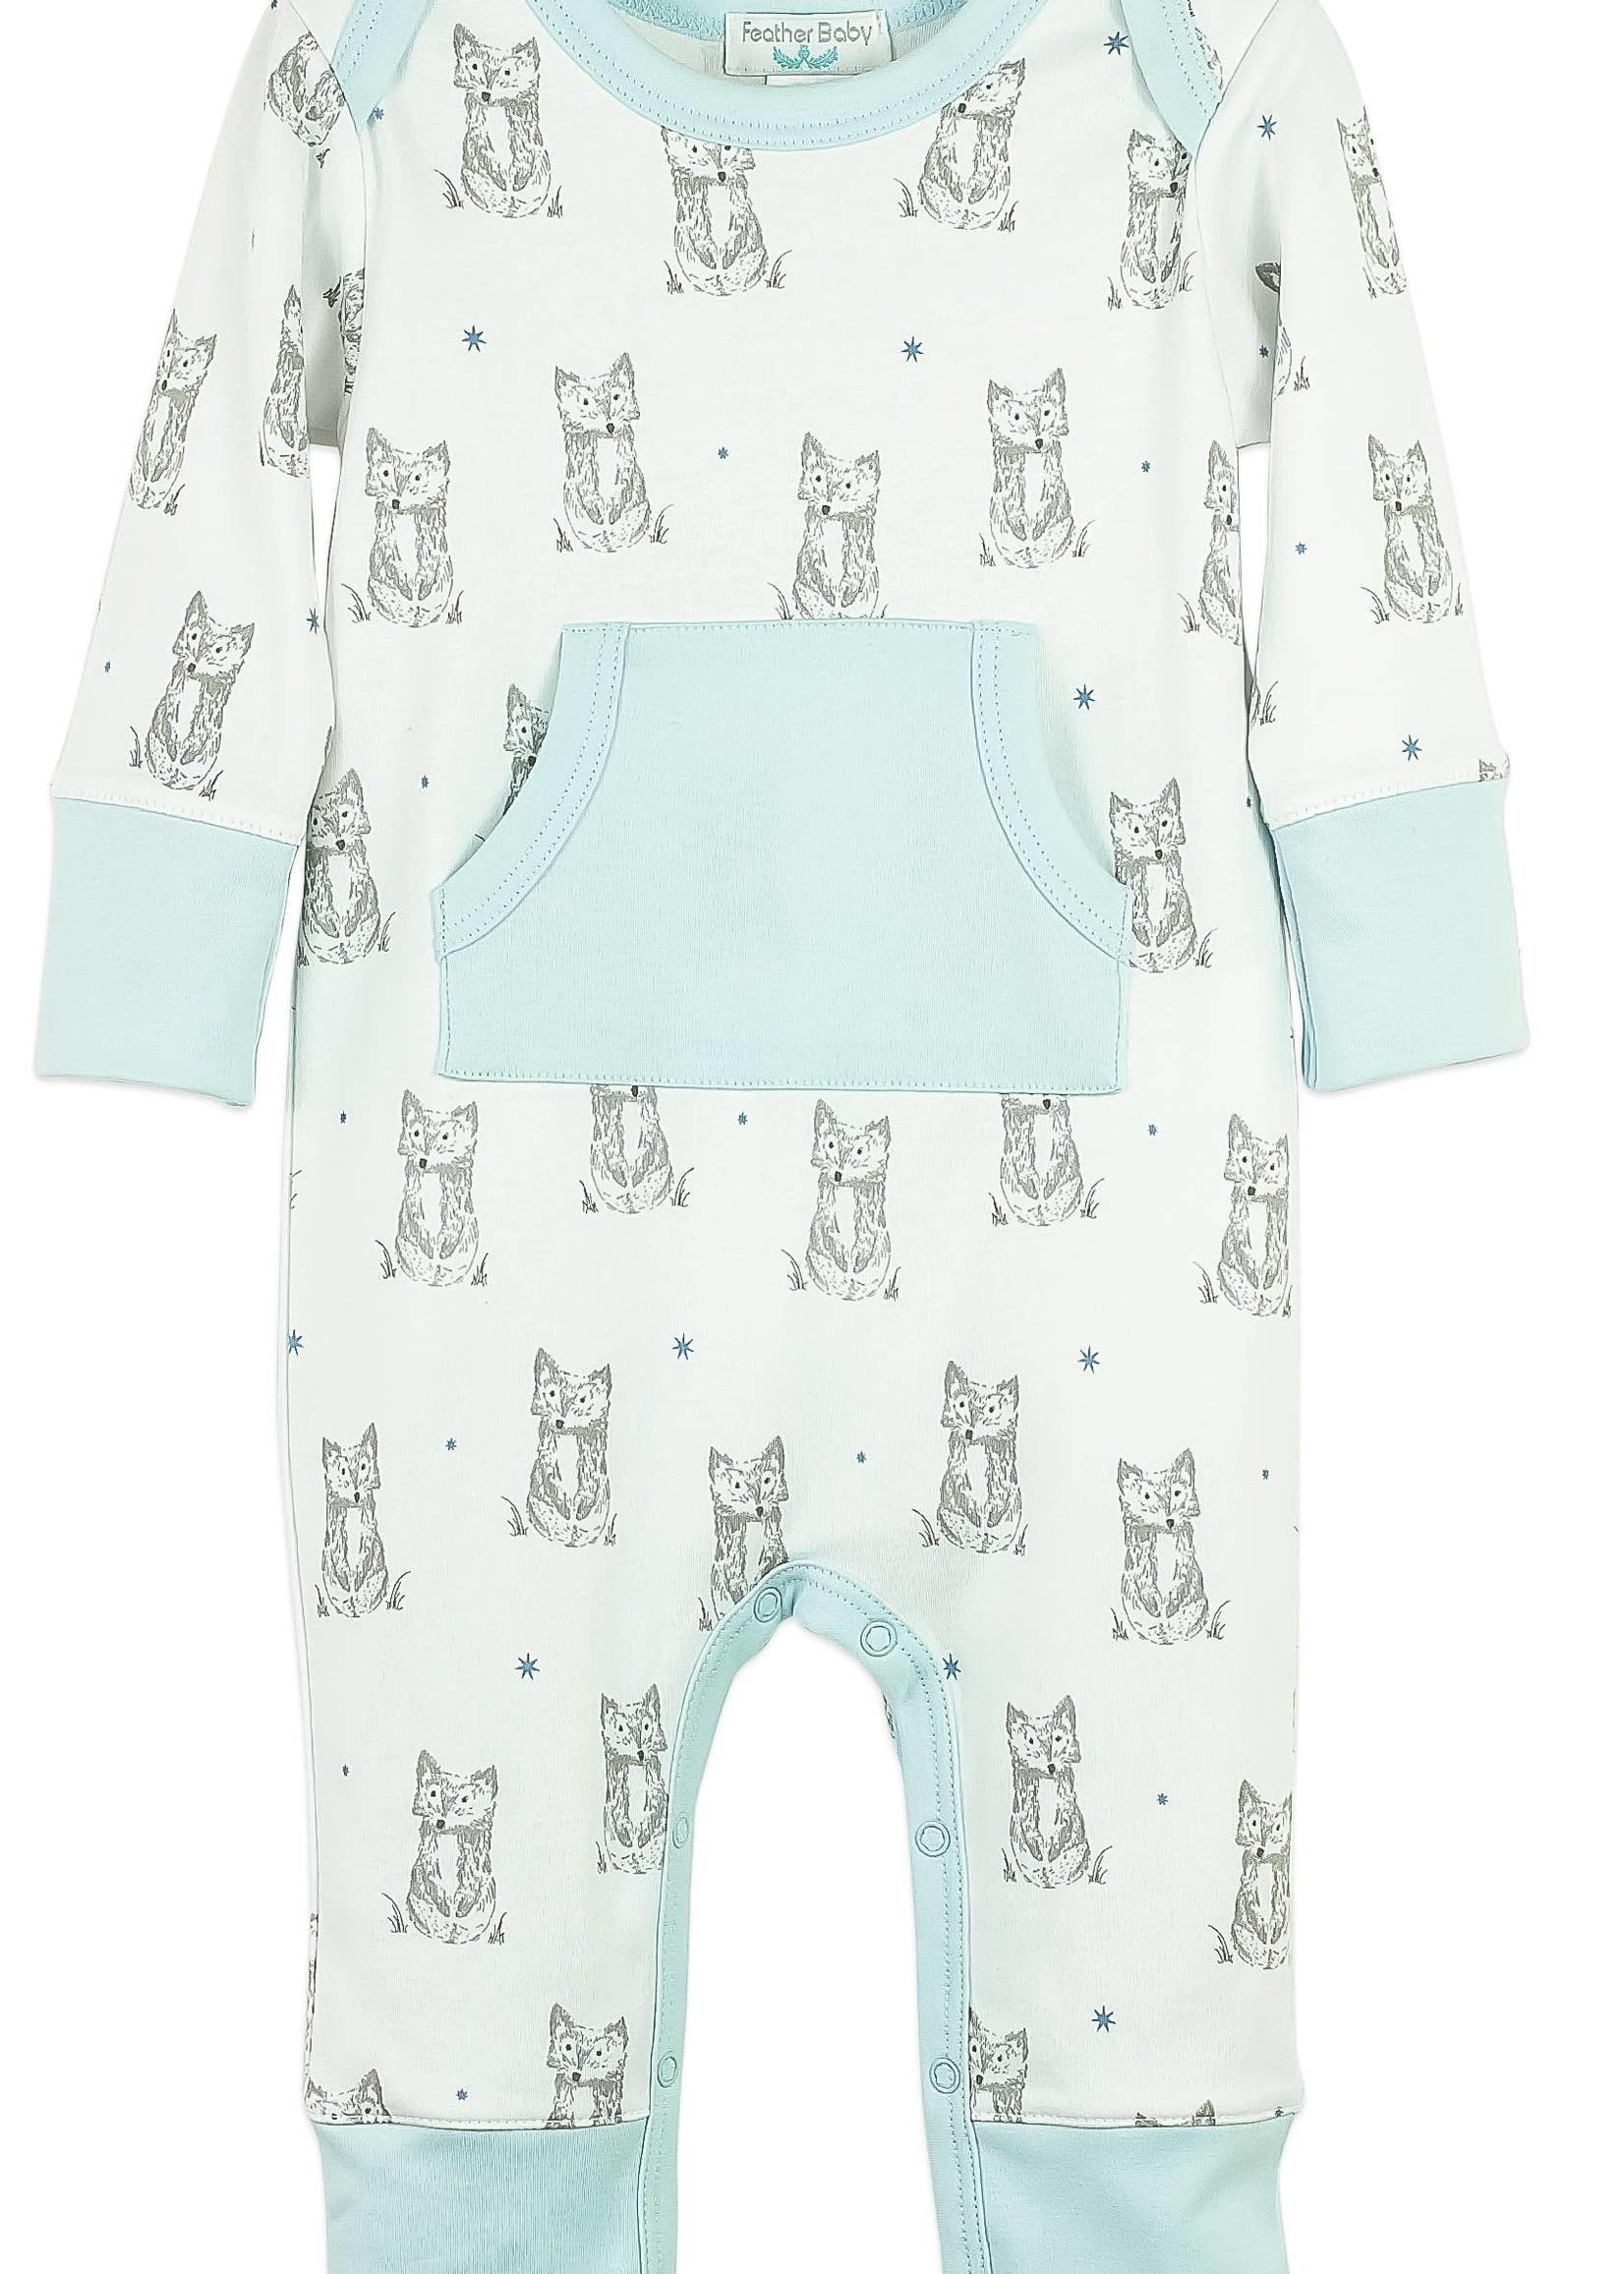 feather baby Patient Fox- White Kangaroo Romper